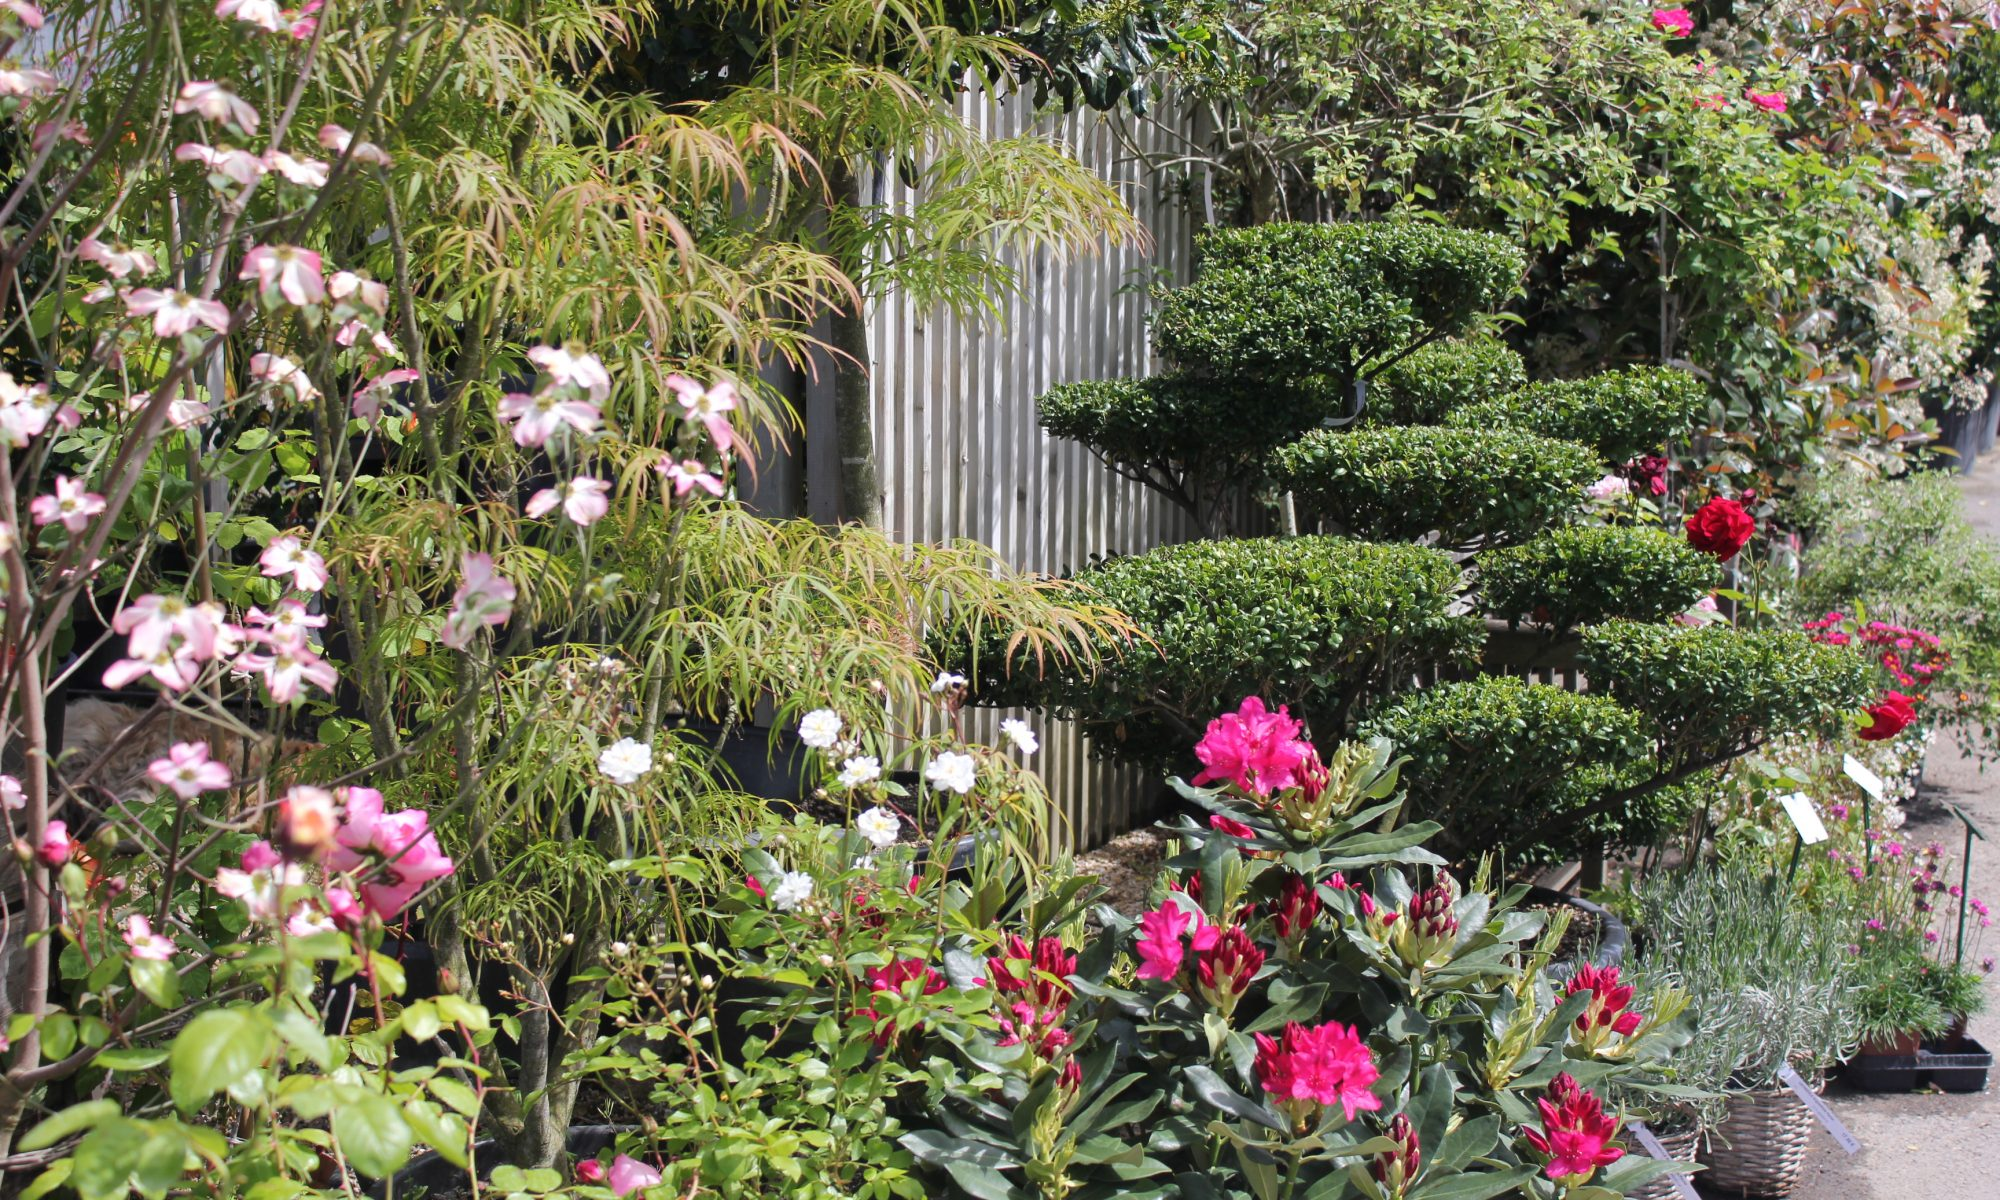 Jardigreen p pini re jardinerie dans les yvelines 78 for Entretien jardin orgeval